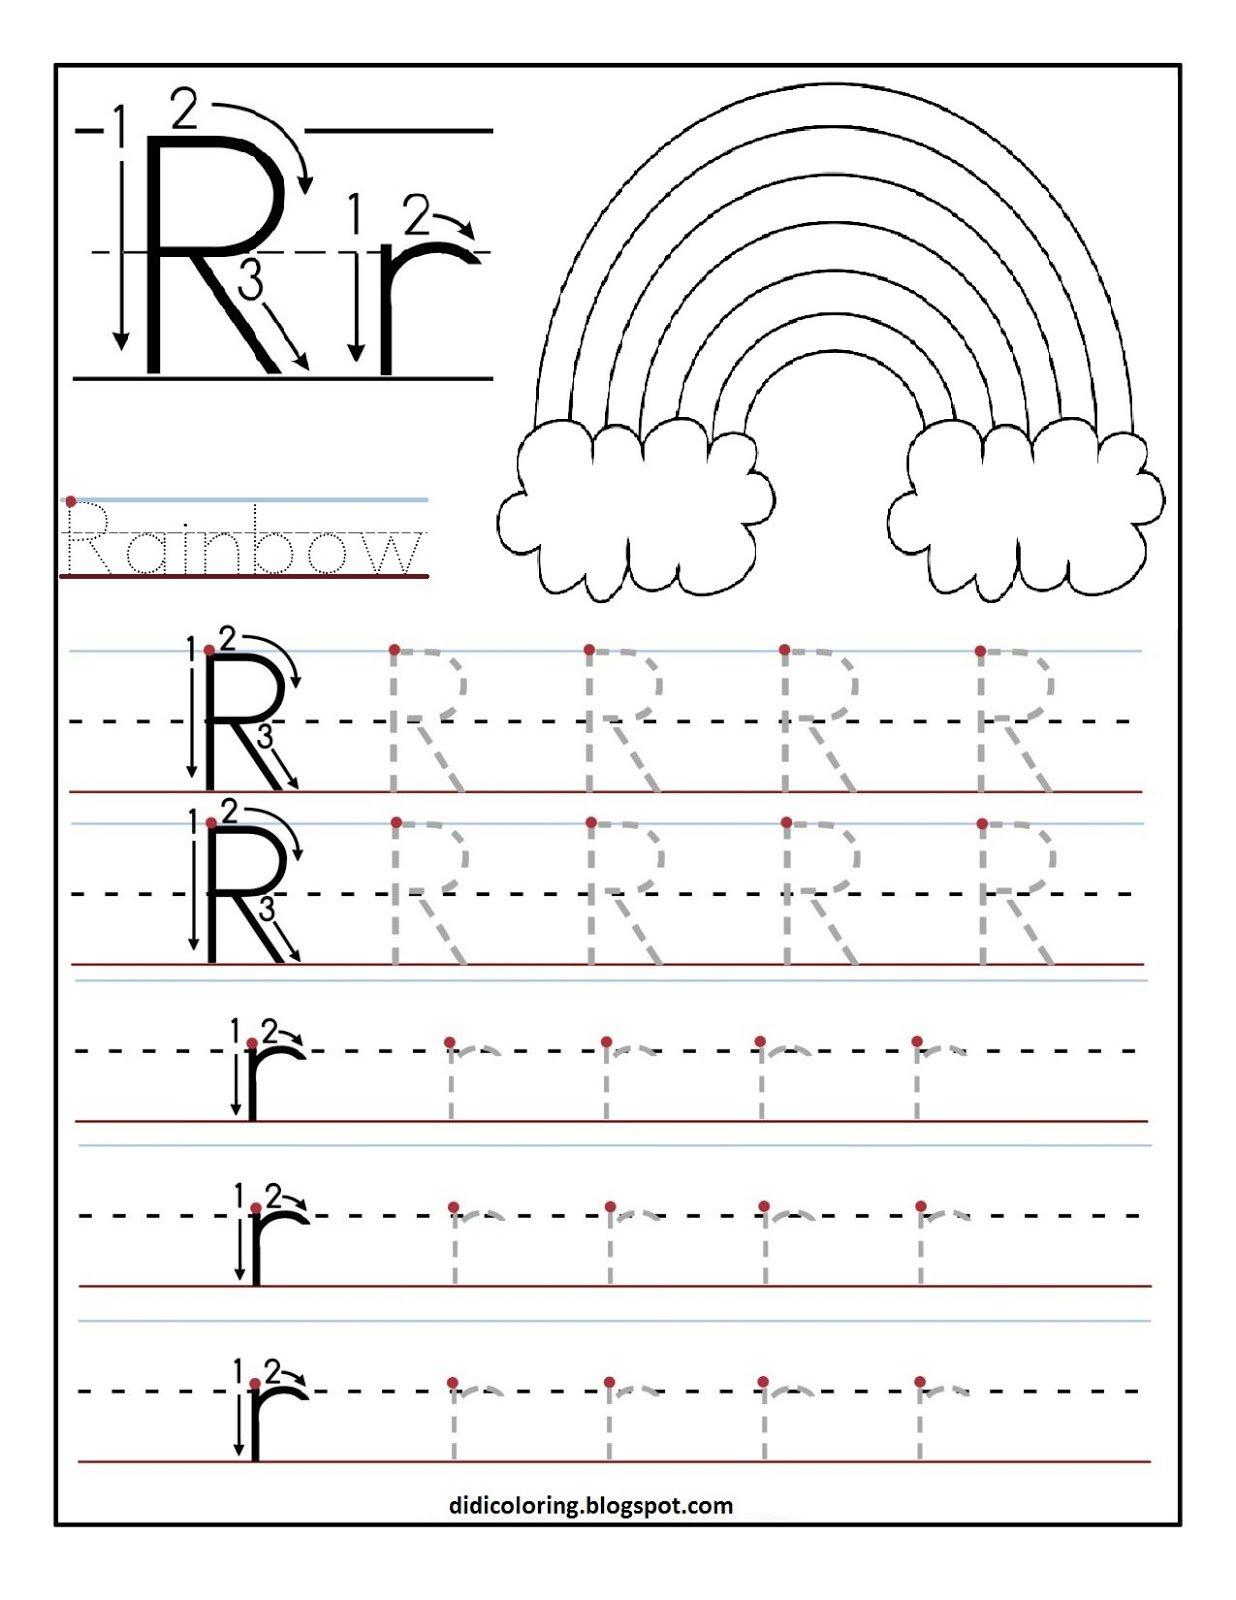 Letter R Printable Worksheets The Best Worksheets Image Collection